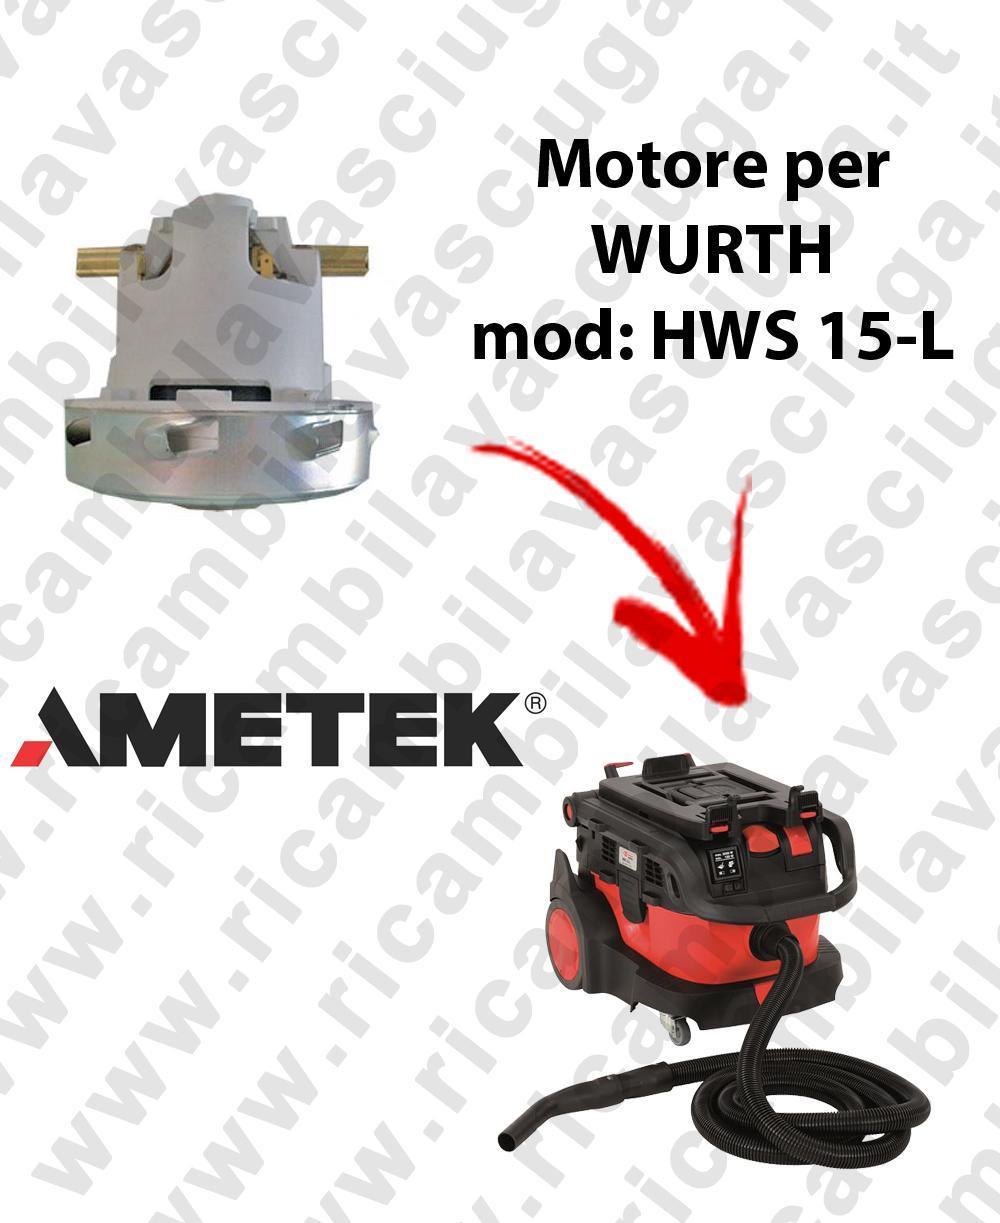 HWS 15-L automatic Motore de aspiración AMETEK para aspiradora WURTH